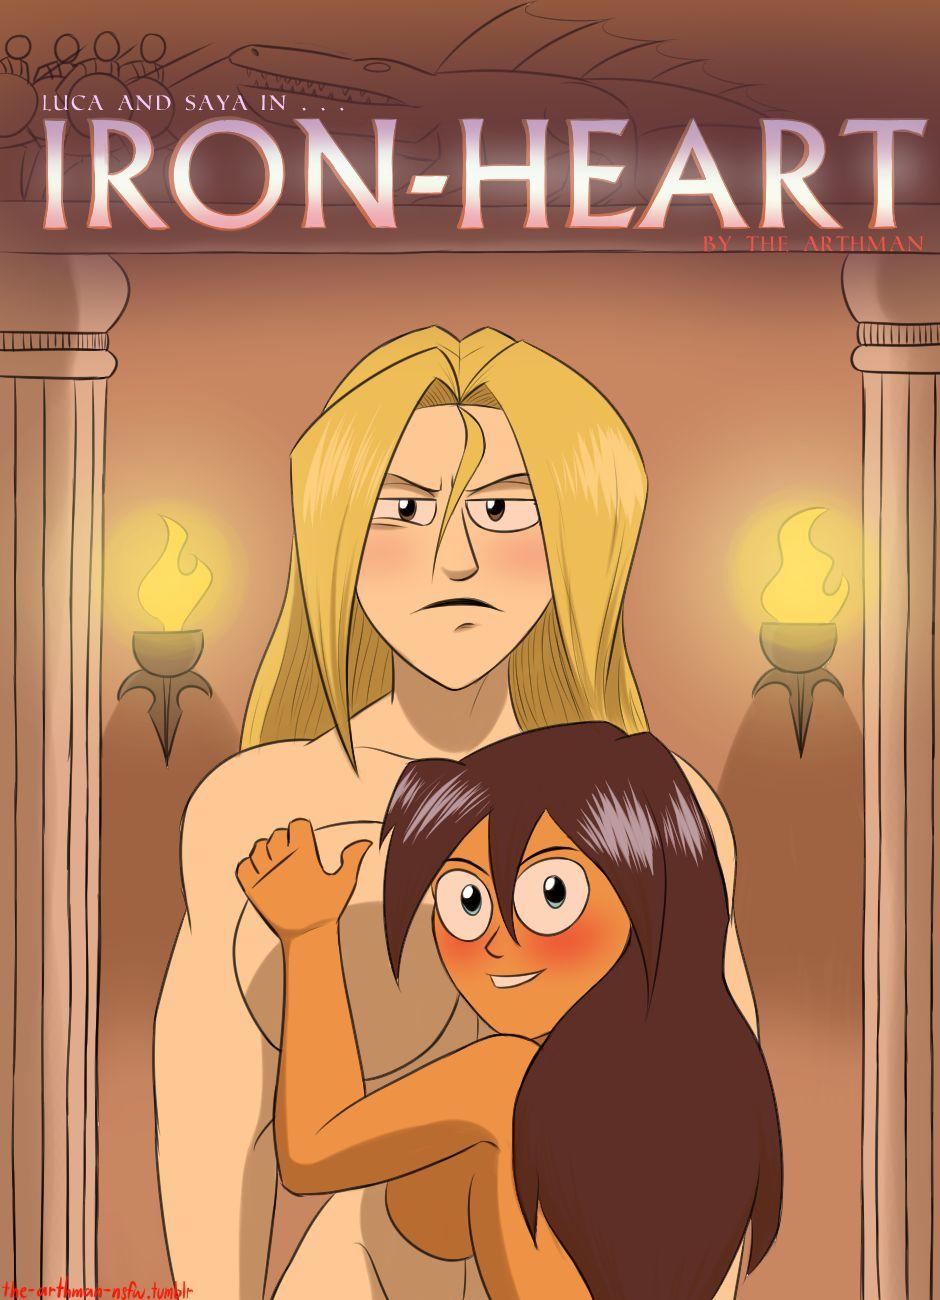 Iron-Heart [The Arthman] porn comics 8 muses